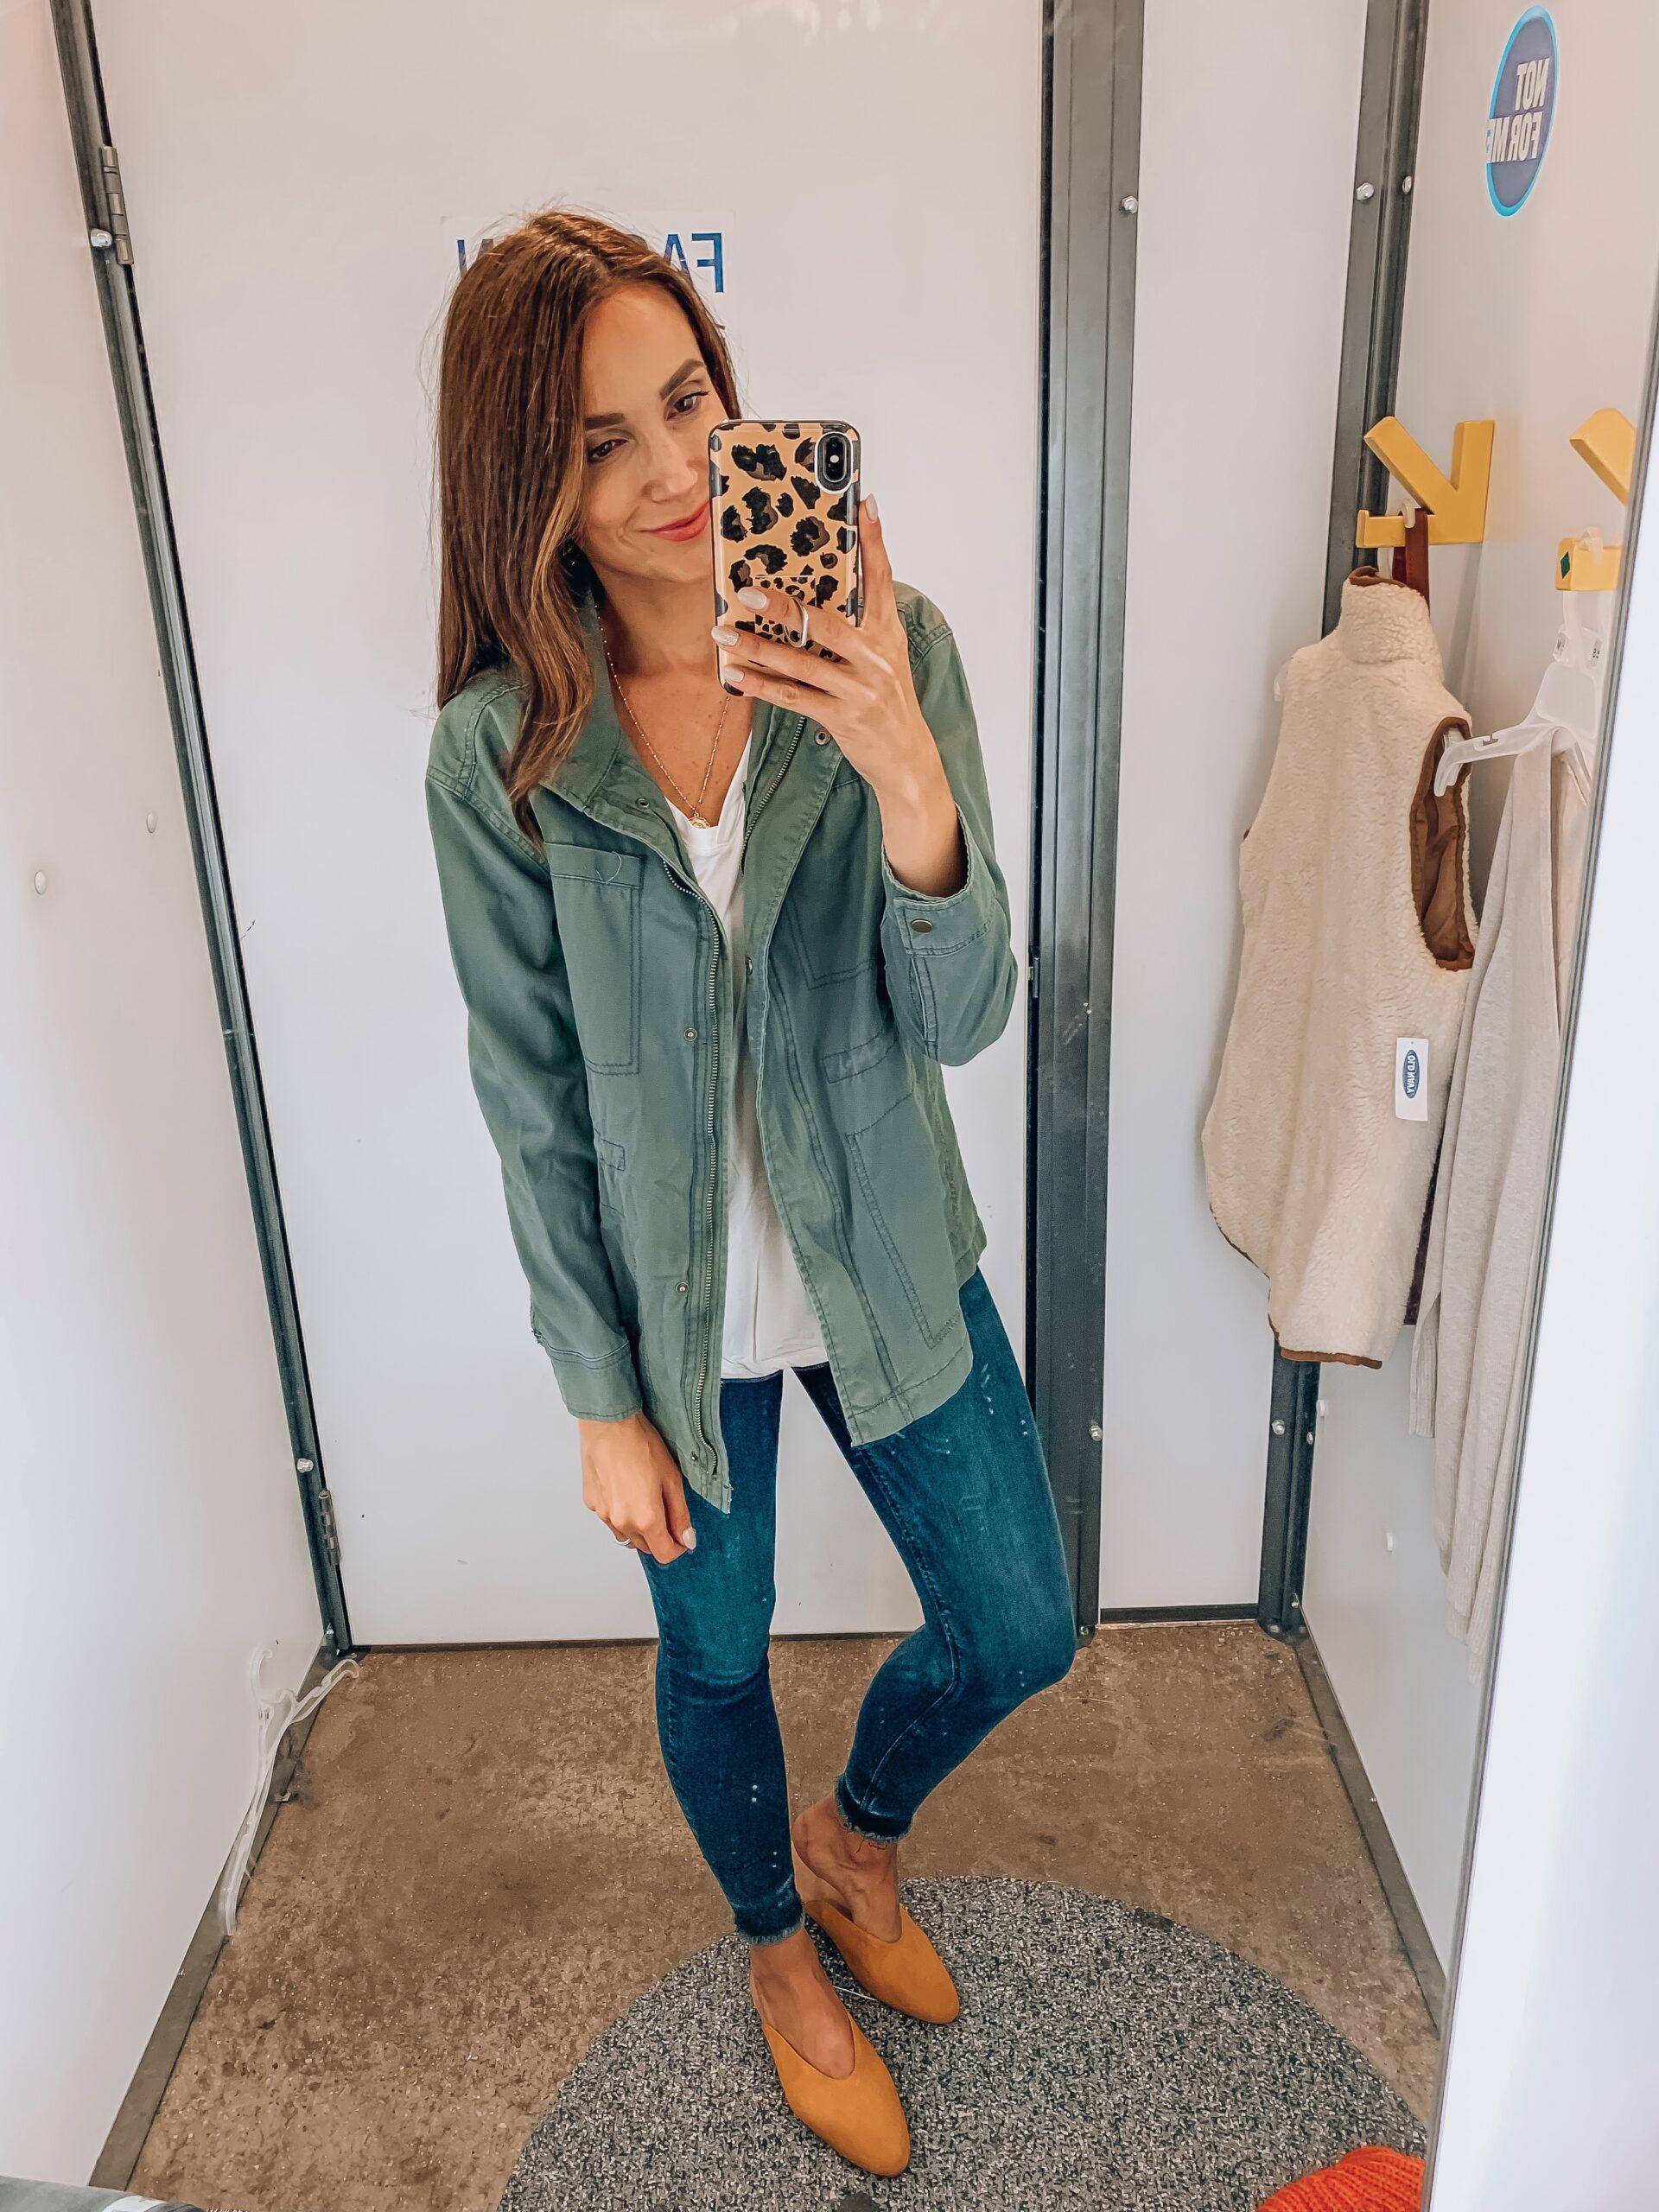 jacket, long tee, jeans, muiles